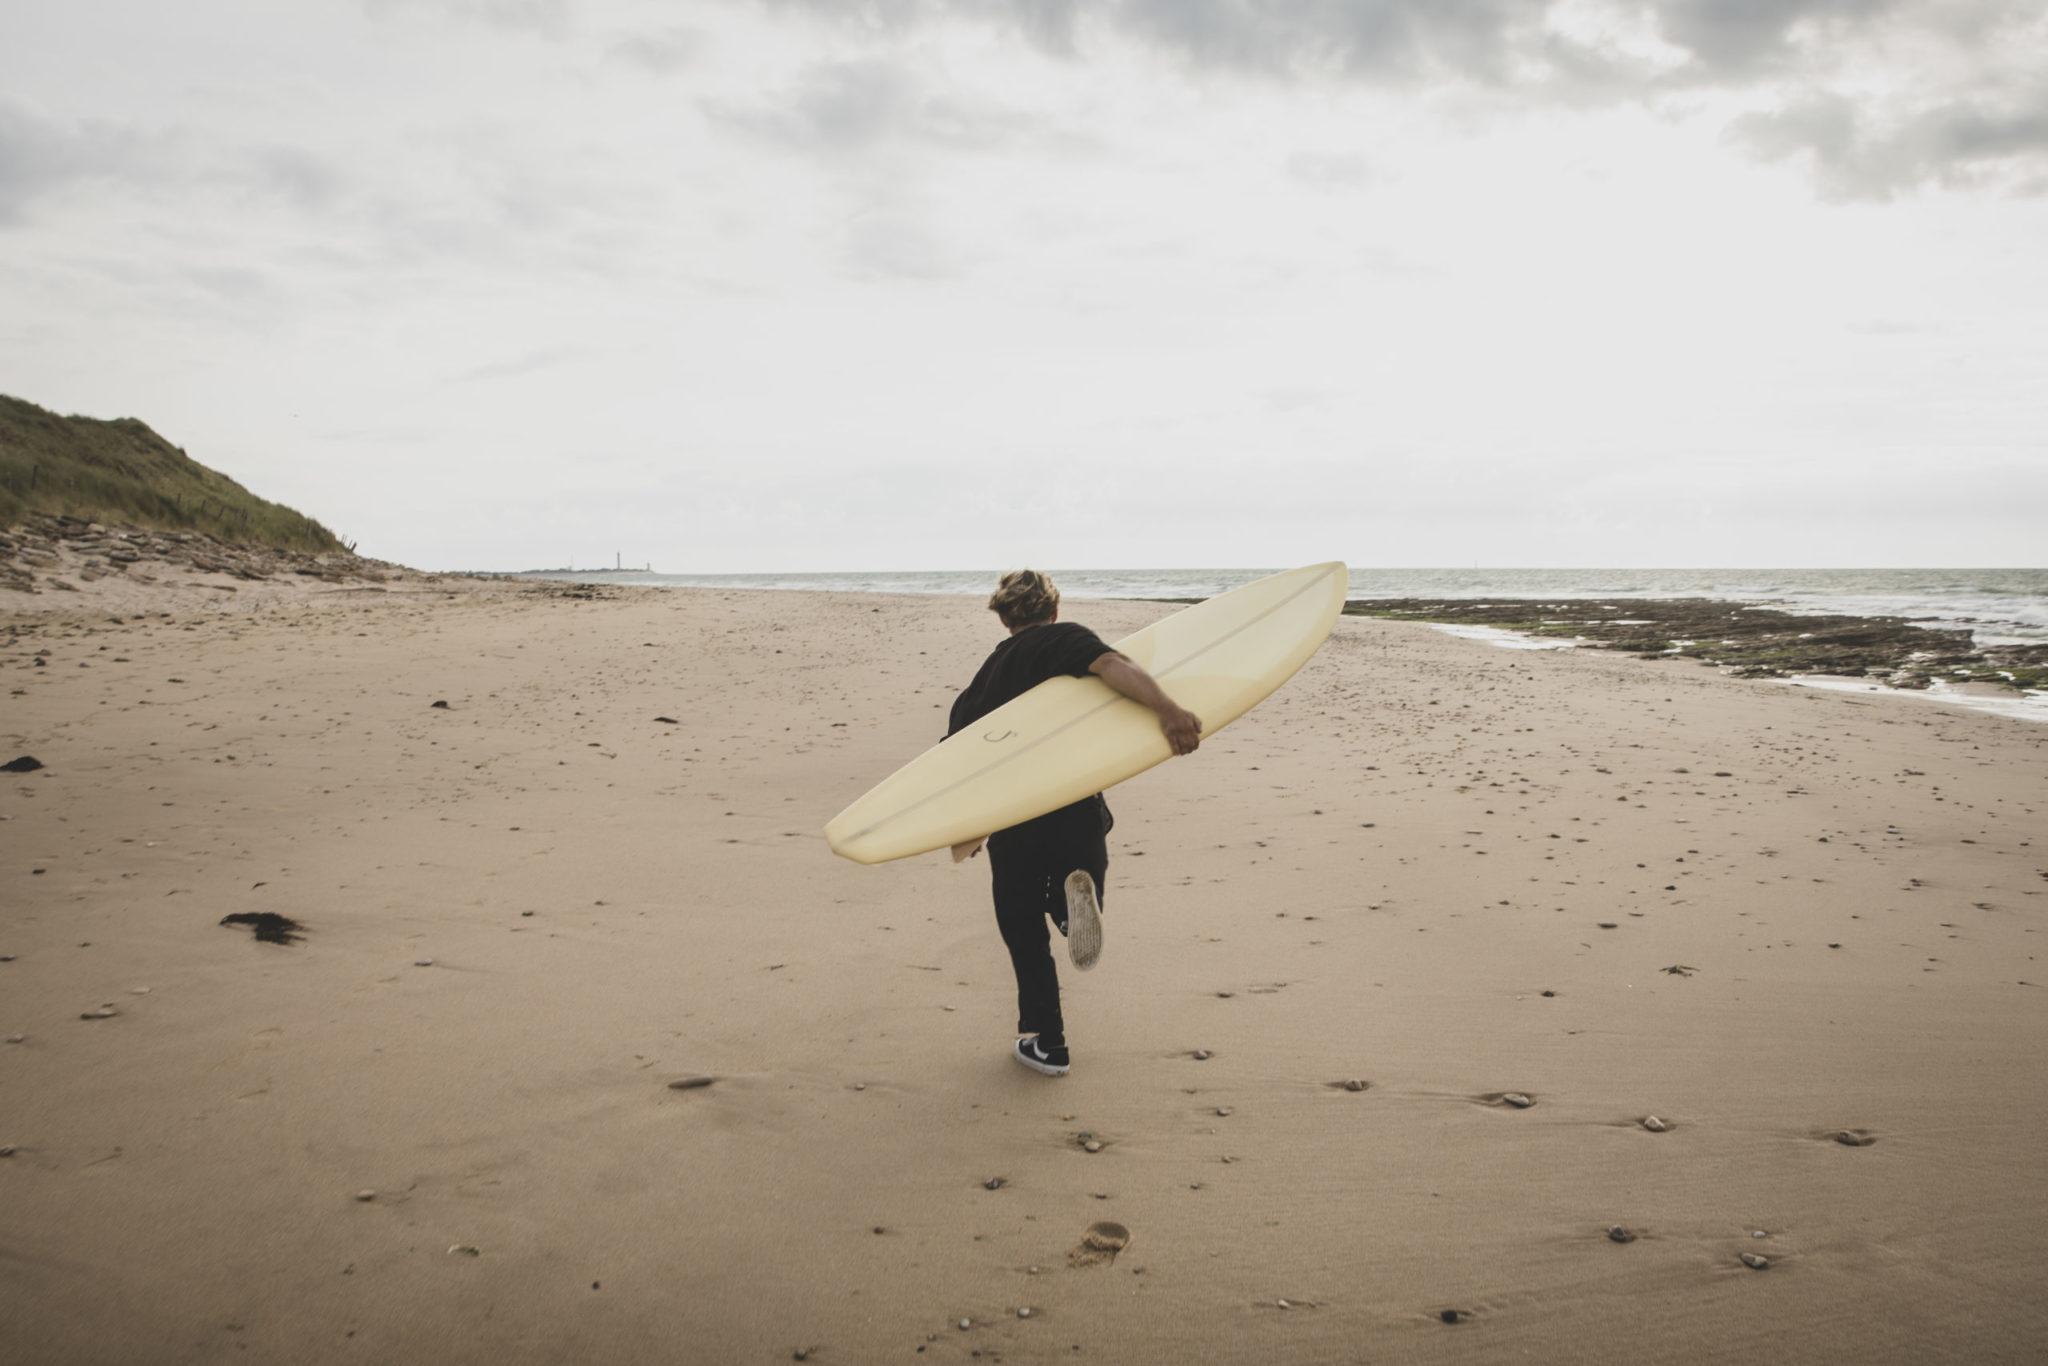 cachalot surfboards artisan hand shaper surf bois hollow wooden eps